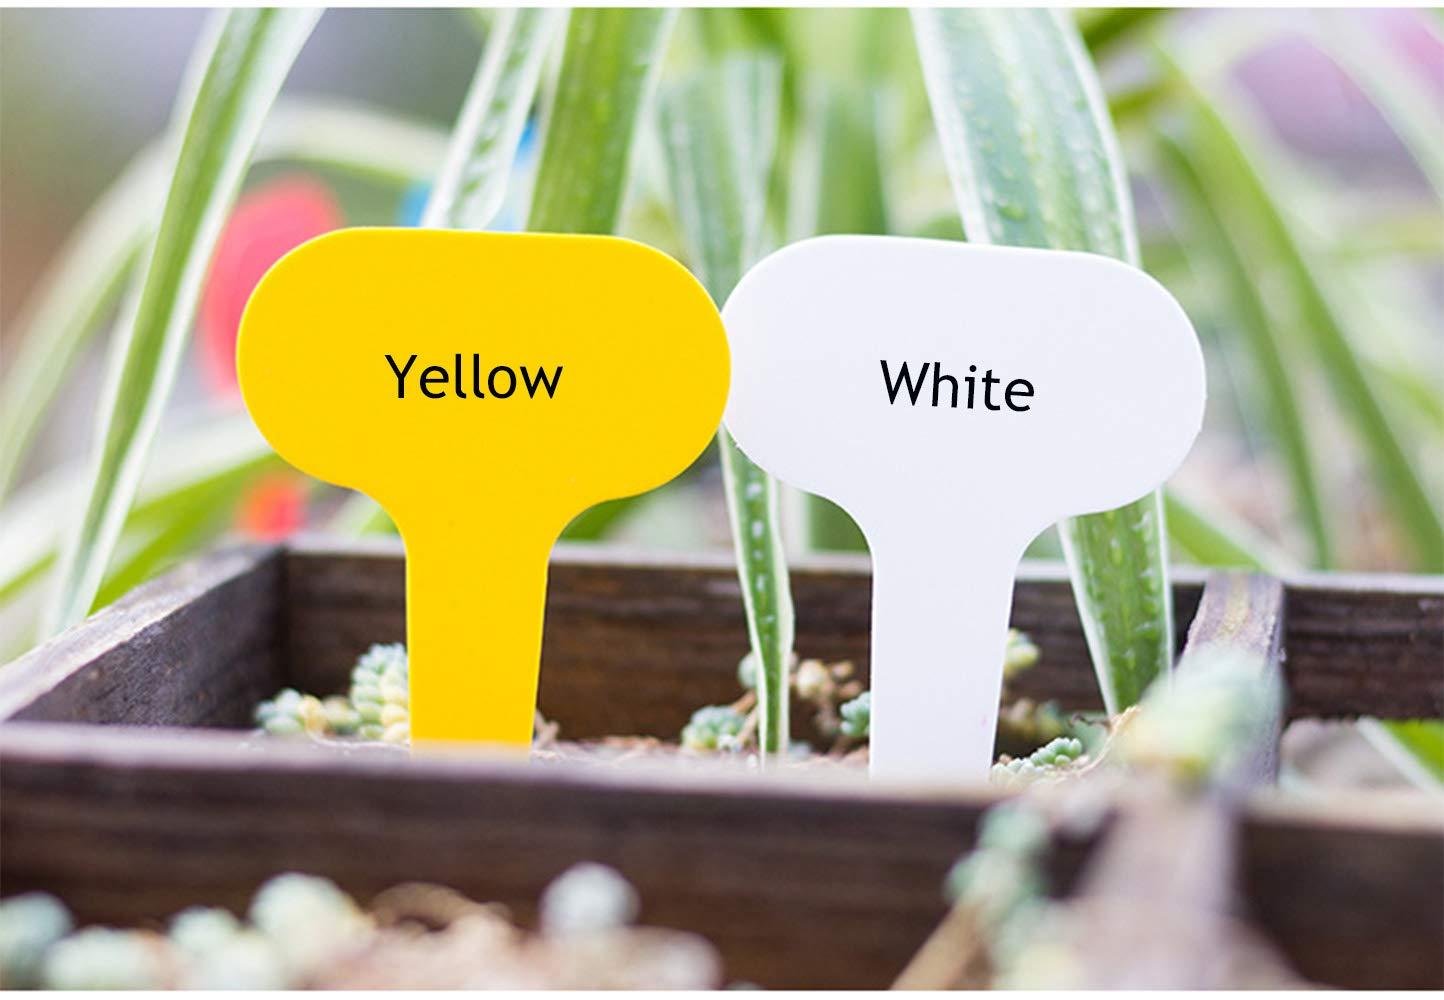 6 Colors 600Pcs 5x7CM Multicolored Plastic Plant Nursery Garden Tags Kalolary Waterproof T-Type Labels Markers Re-usable Plant Labels